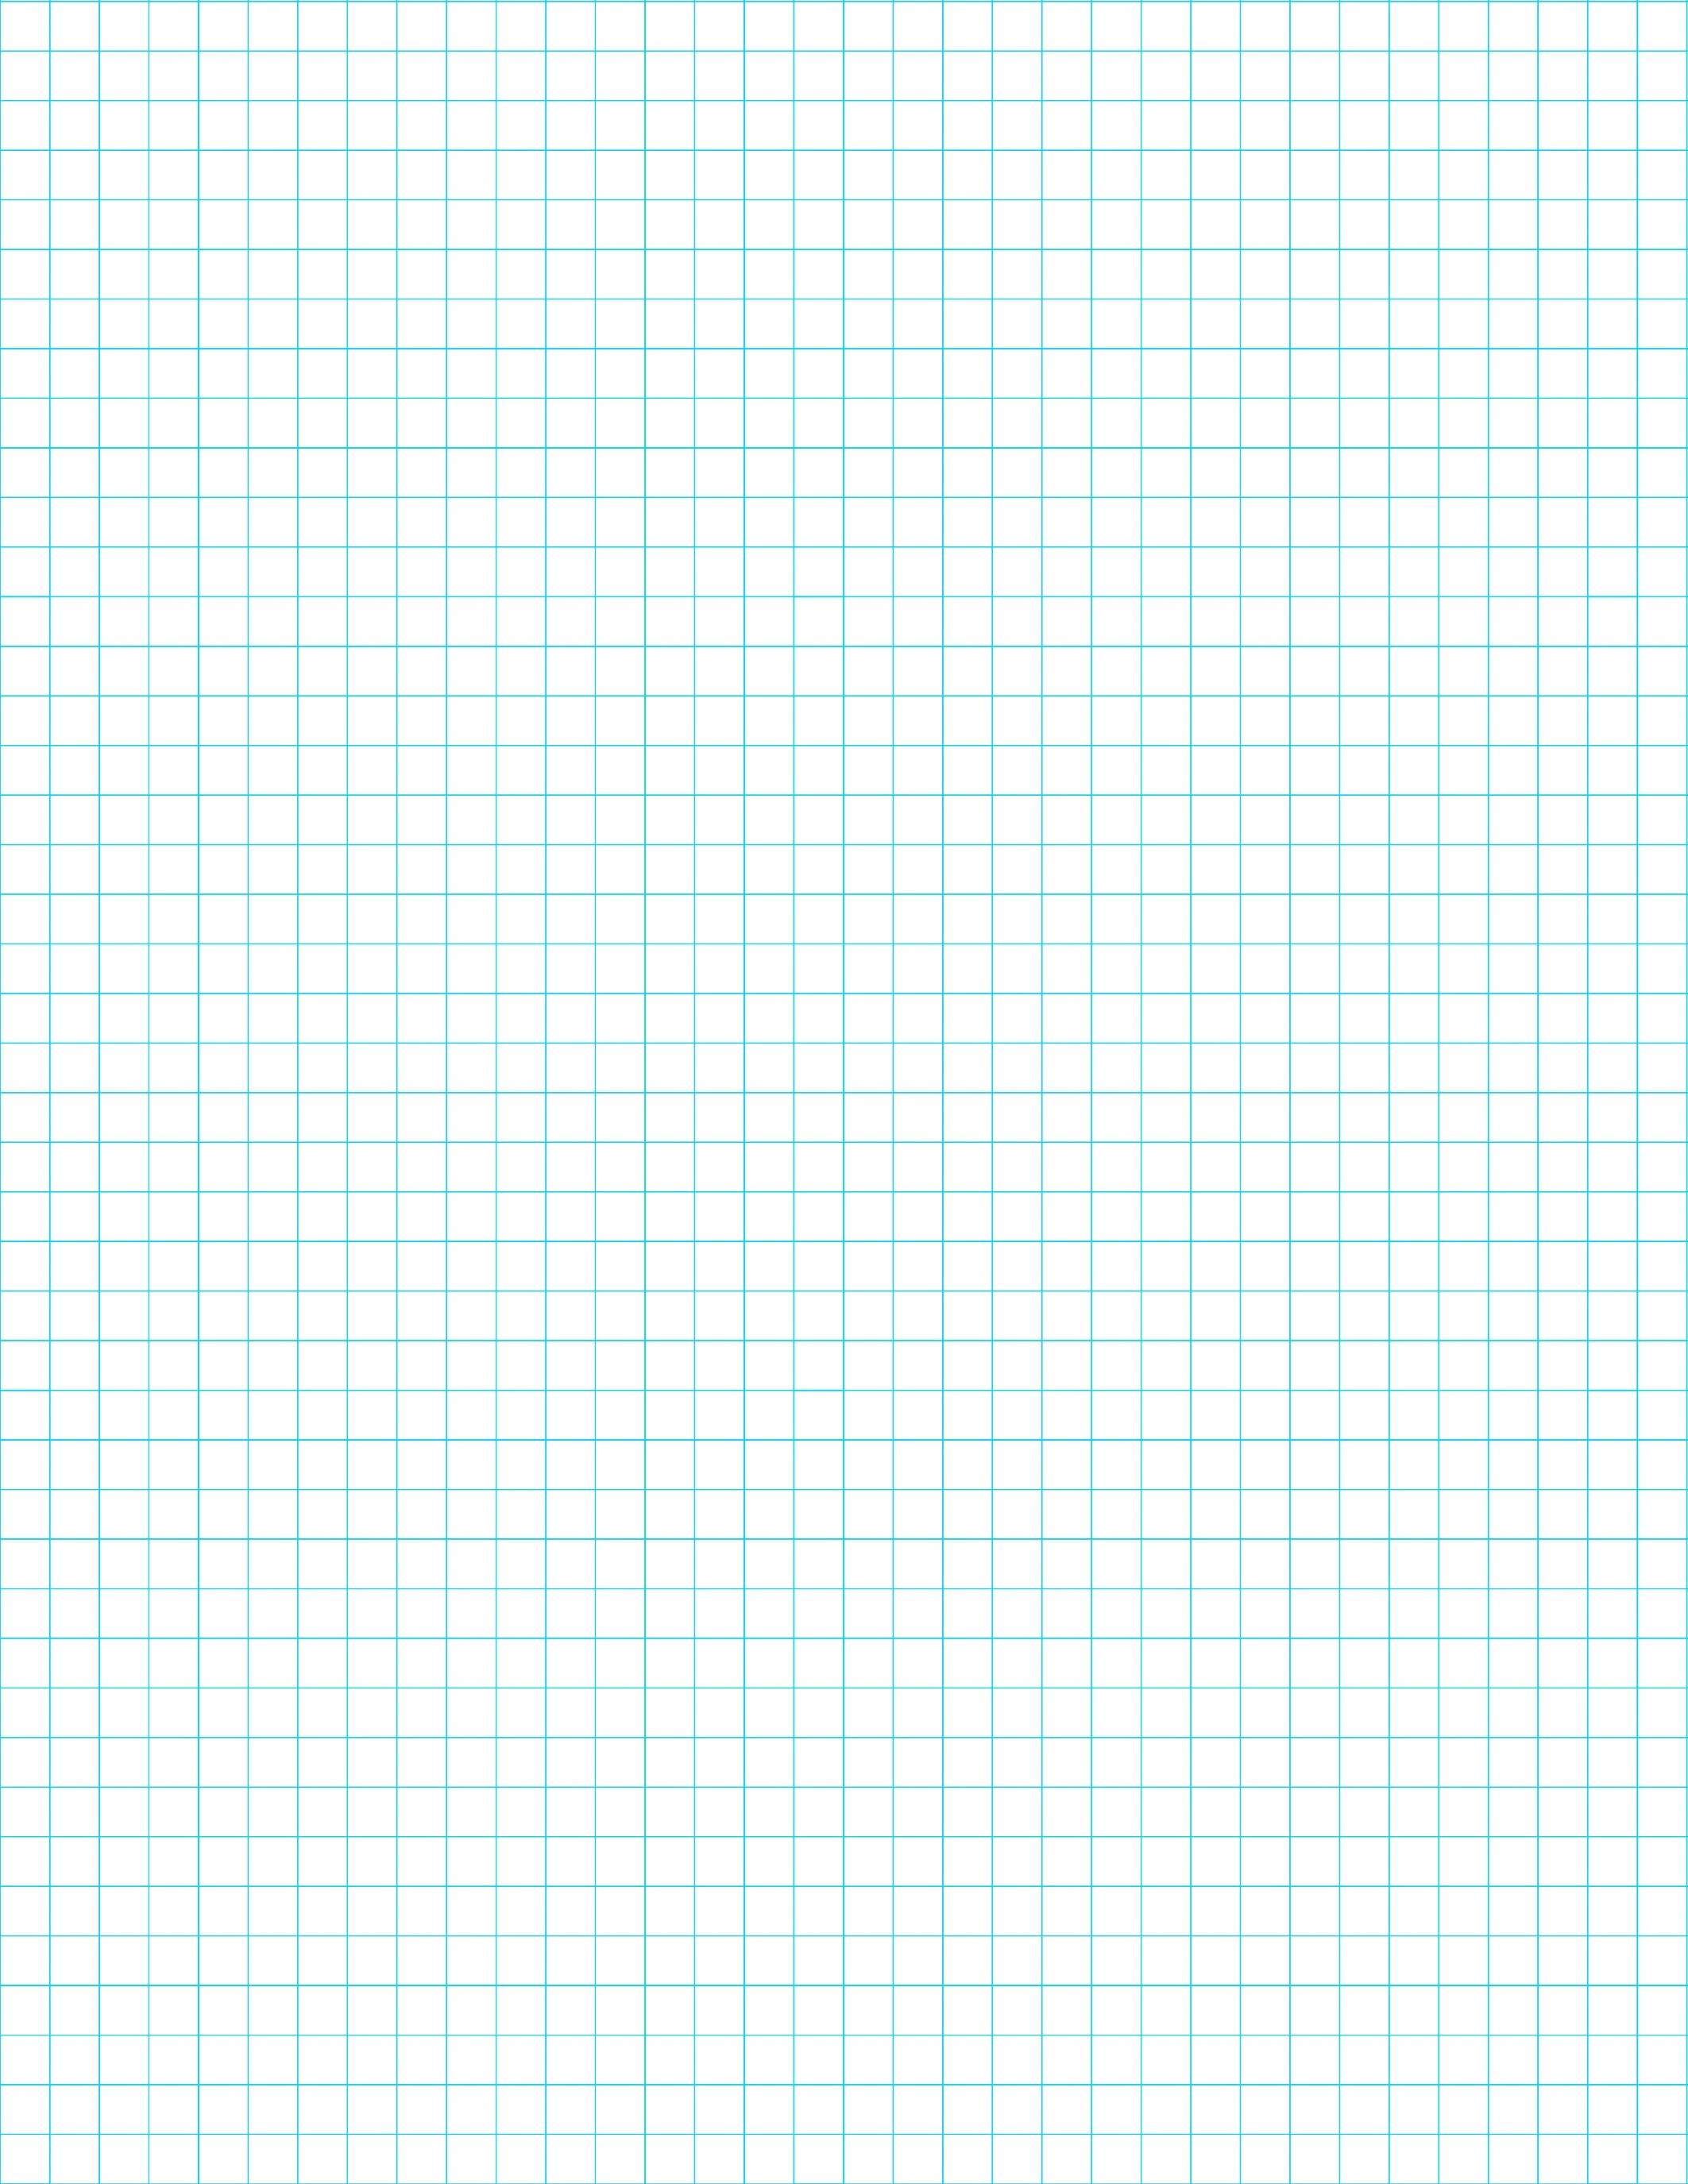 Free Printable Graph Paper - Paper Trail Design - Free Printable Graph Paper 1 4 Inch